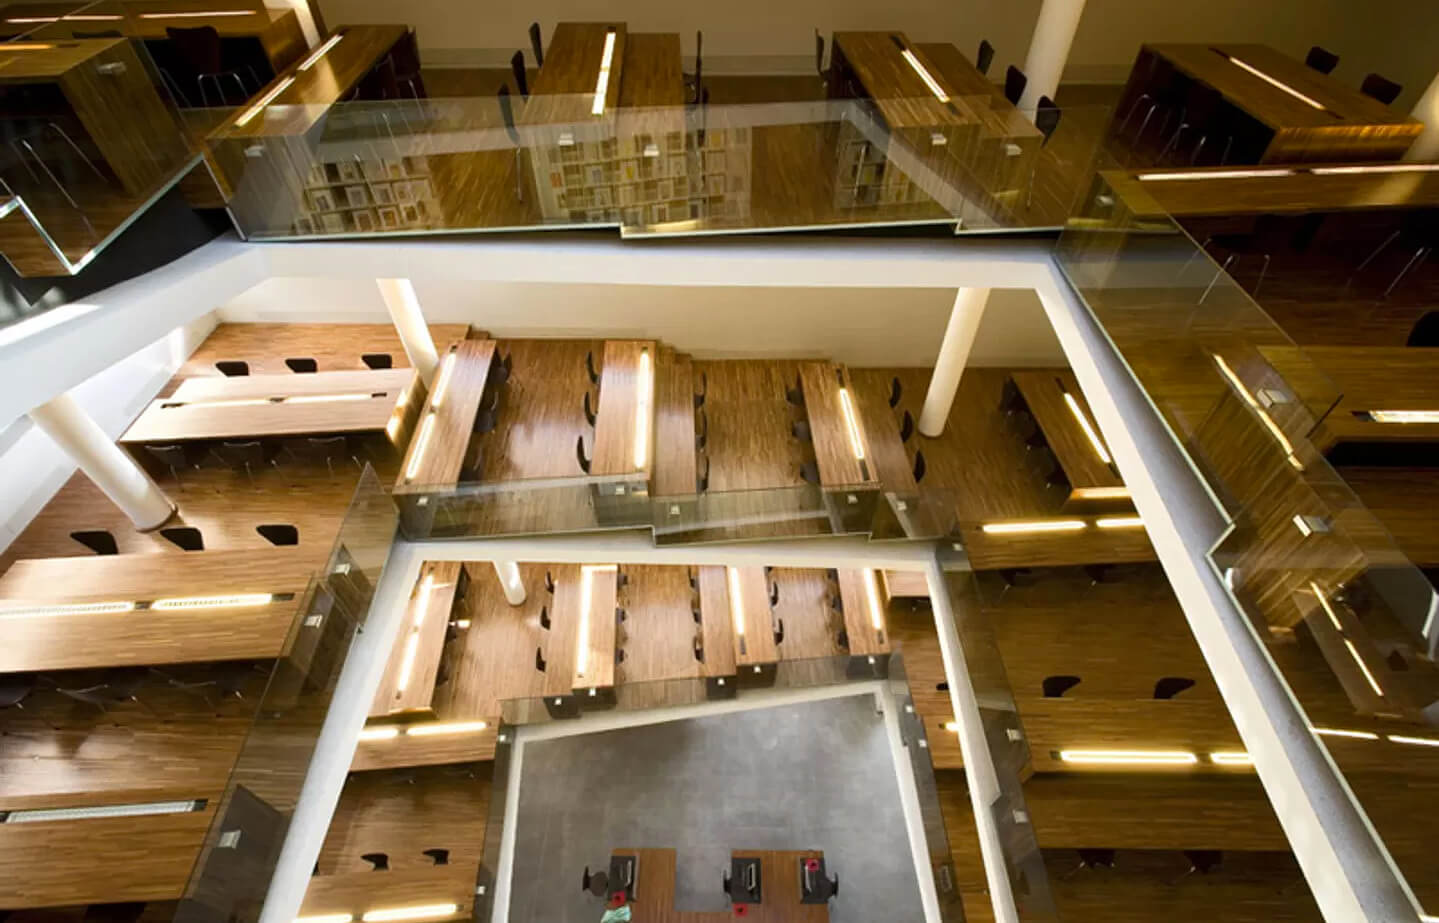 Pontifical Lateran University Library